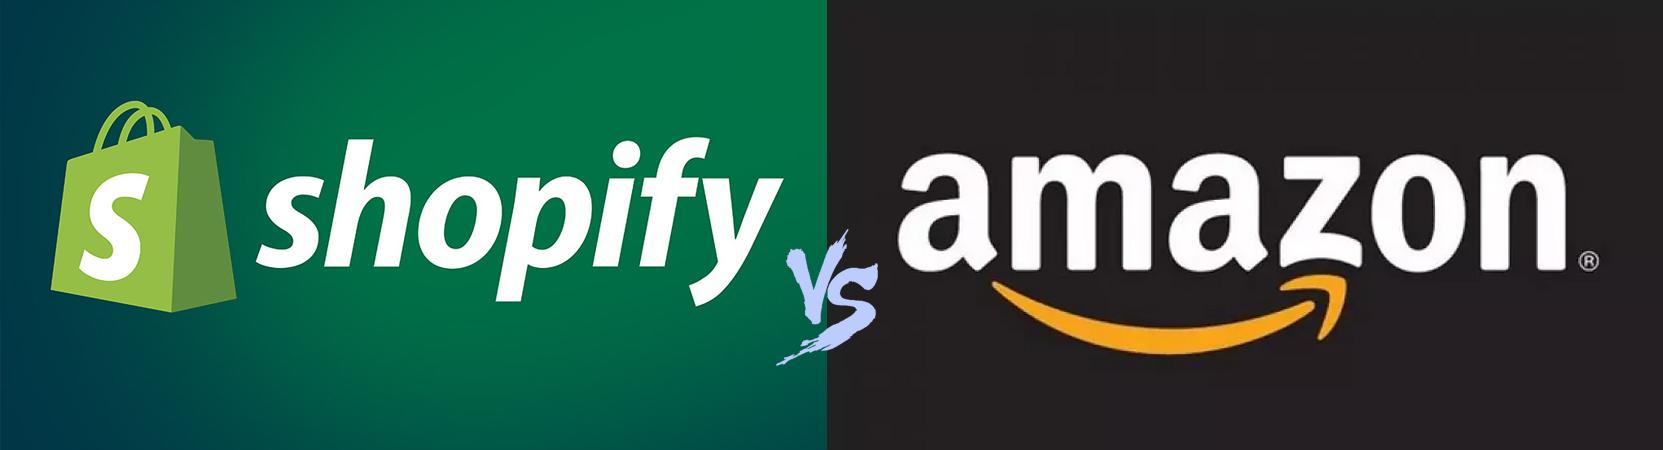 Shopify Vs Amazon: The Battle Between The Two Giants!